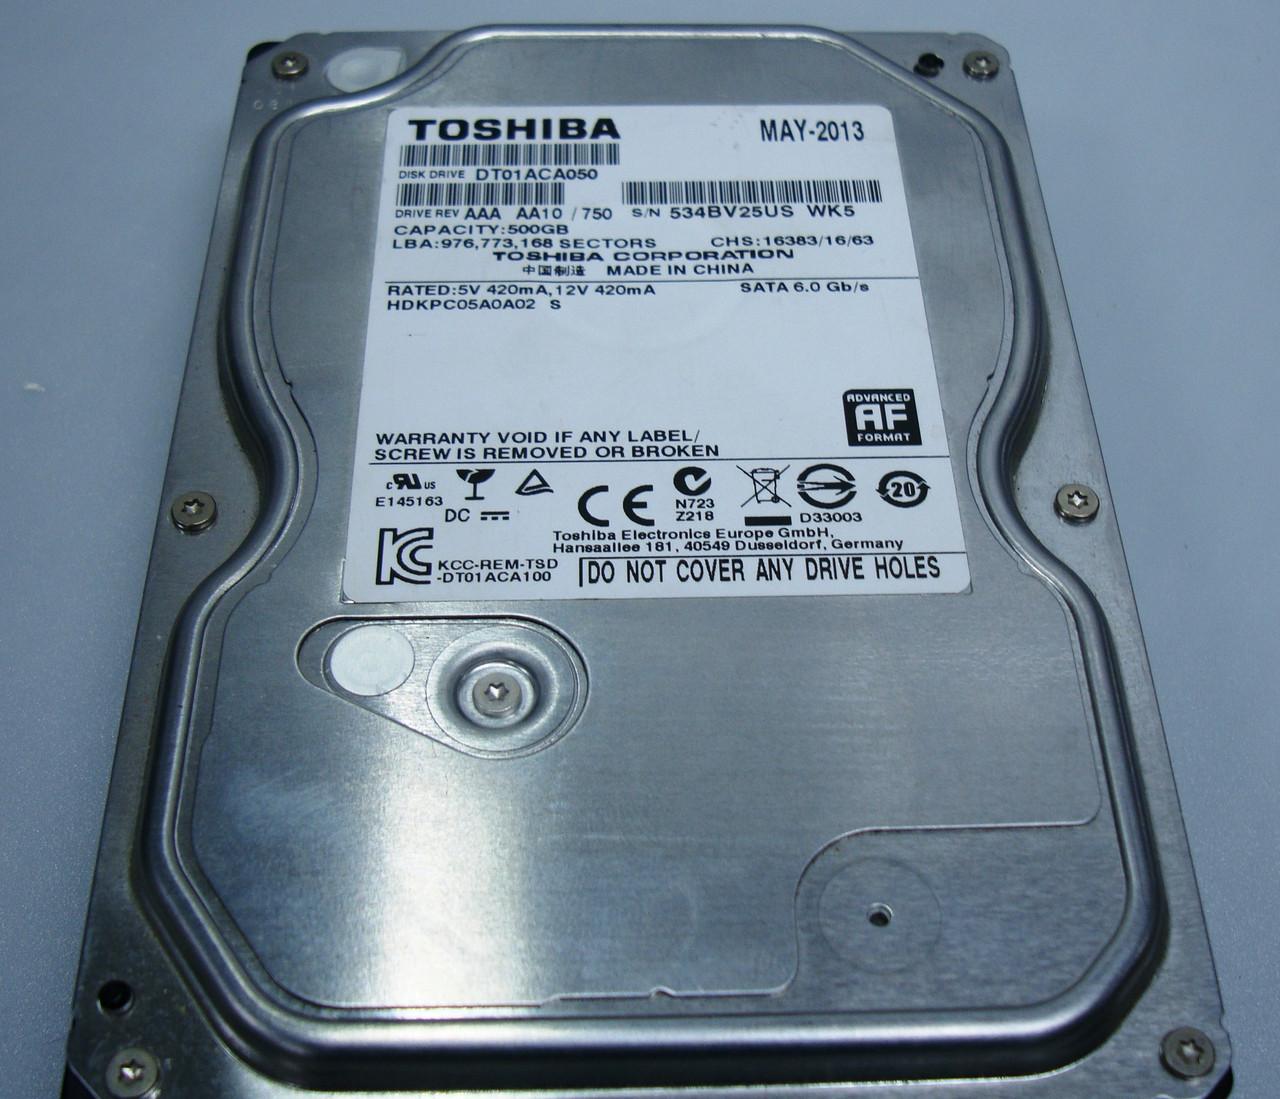 Жесткий диск Toshiba 500GB 7200rpm 32MB, 3.5 SATA III